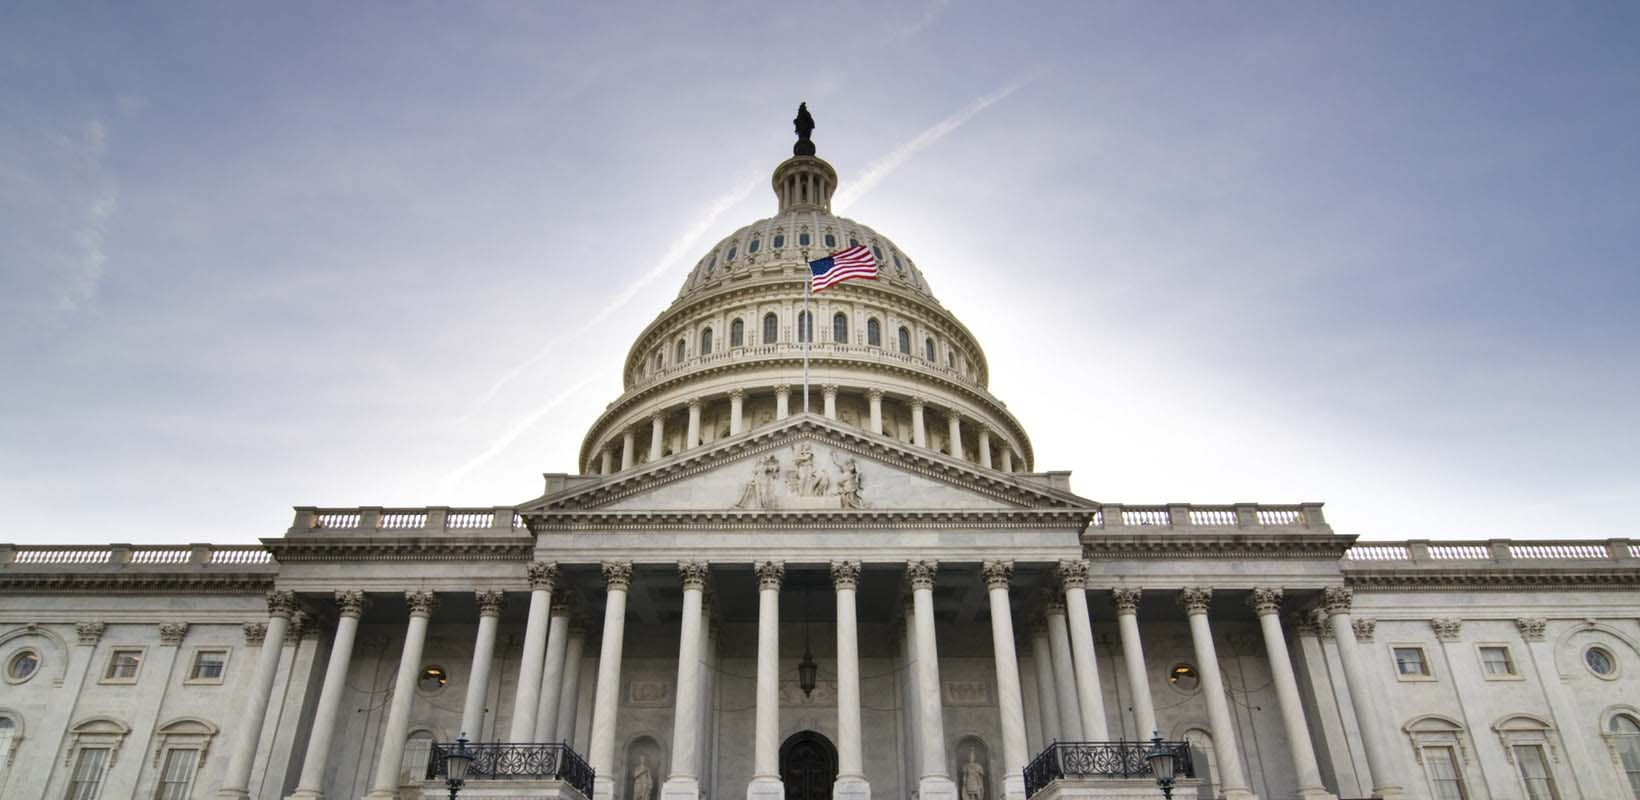 American politics & debate on Capitol Hill tour